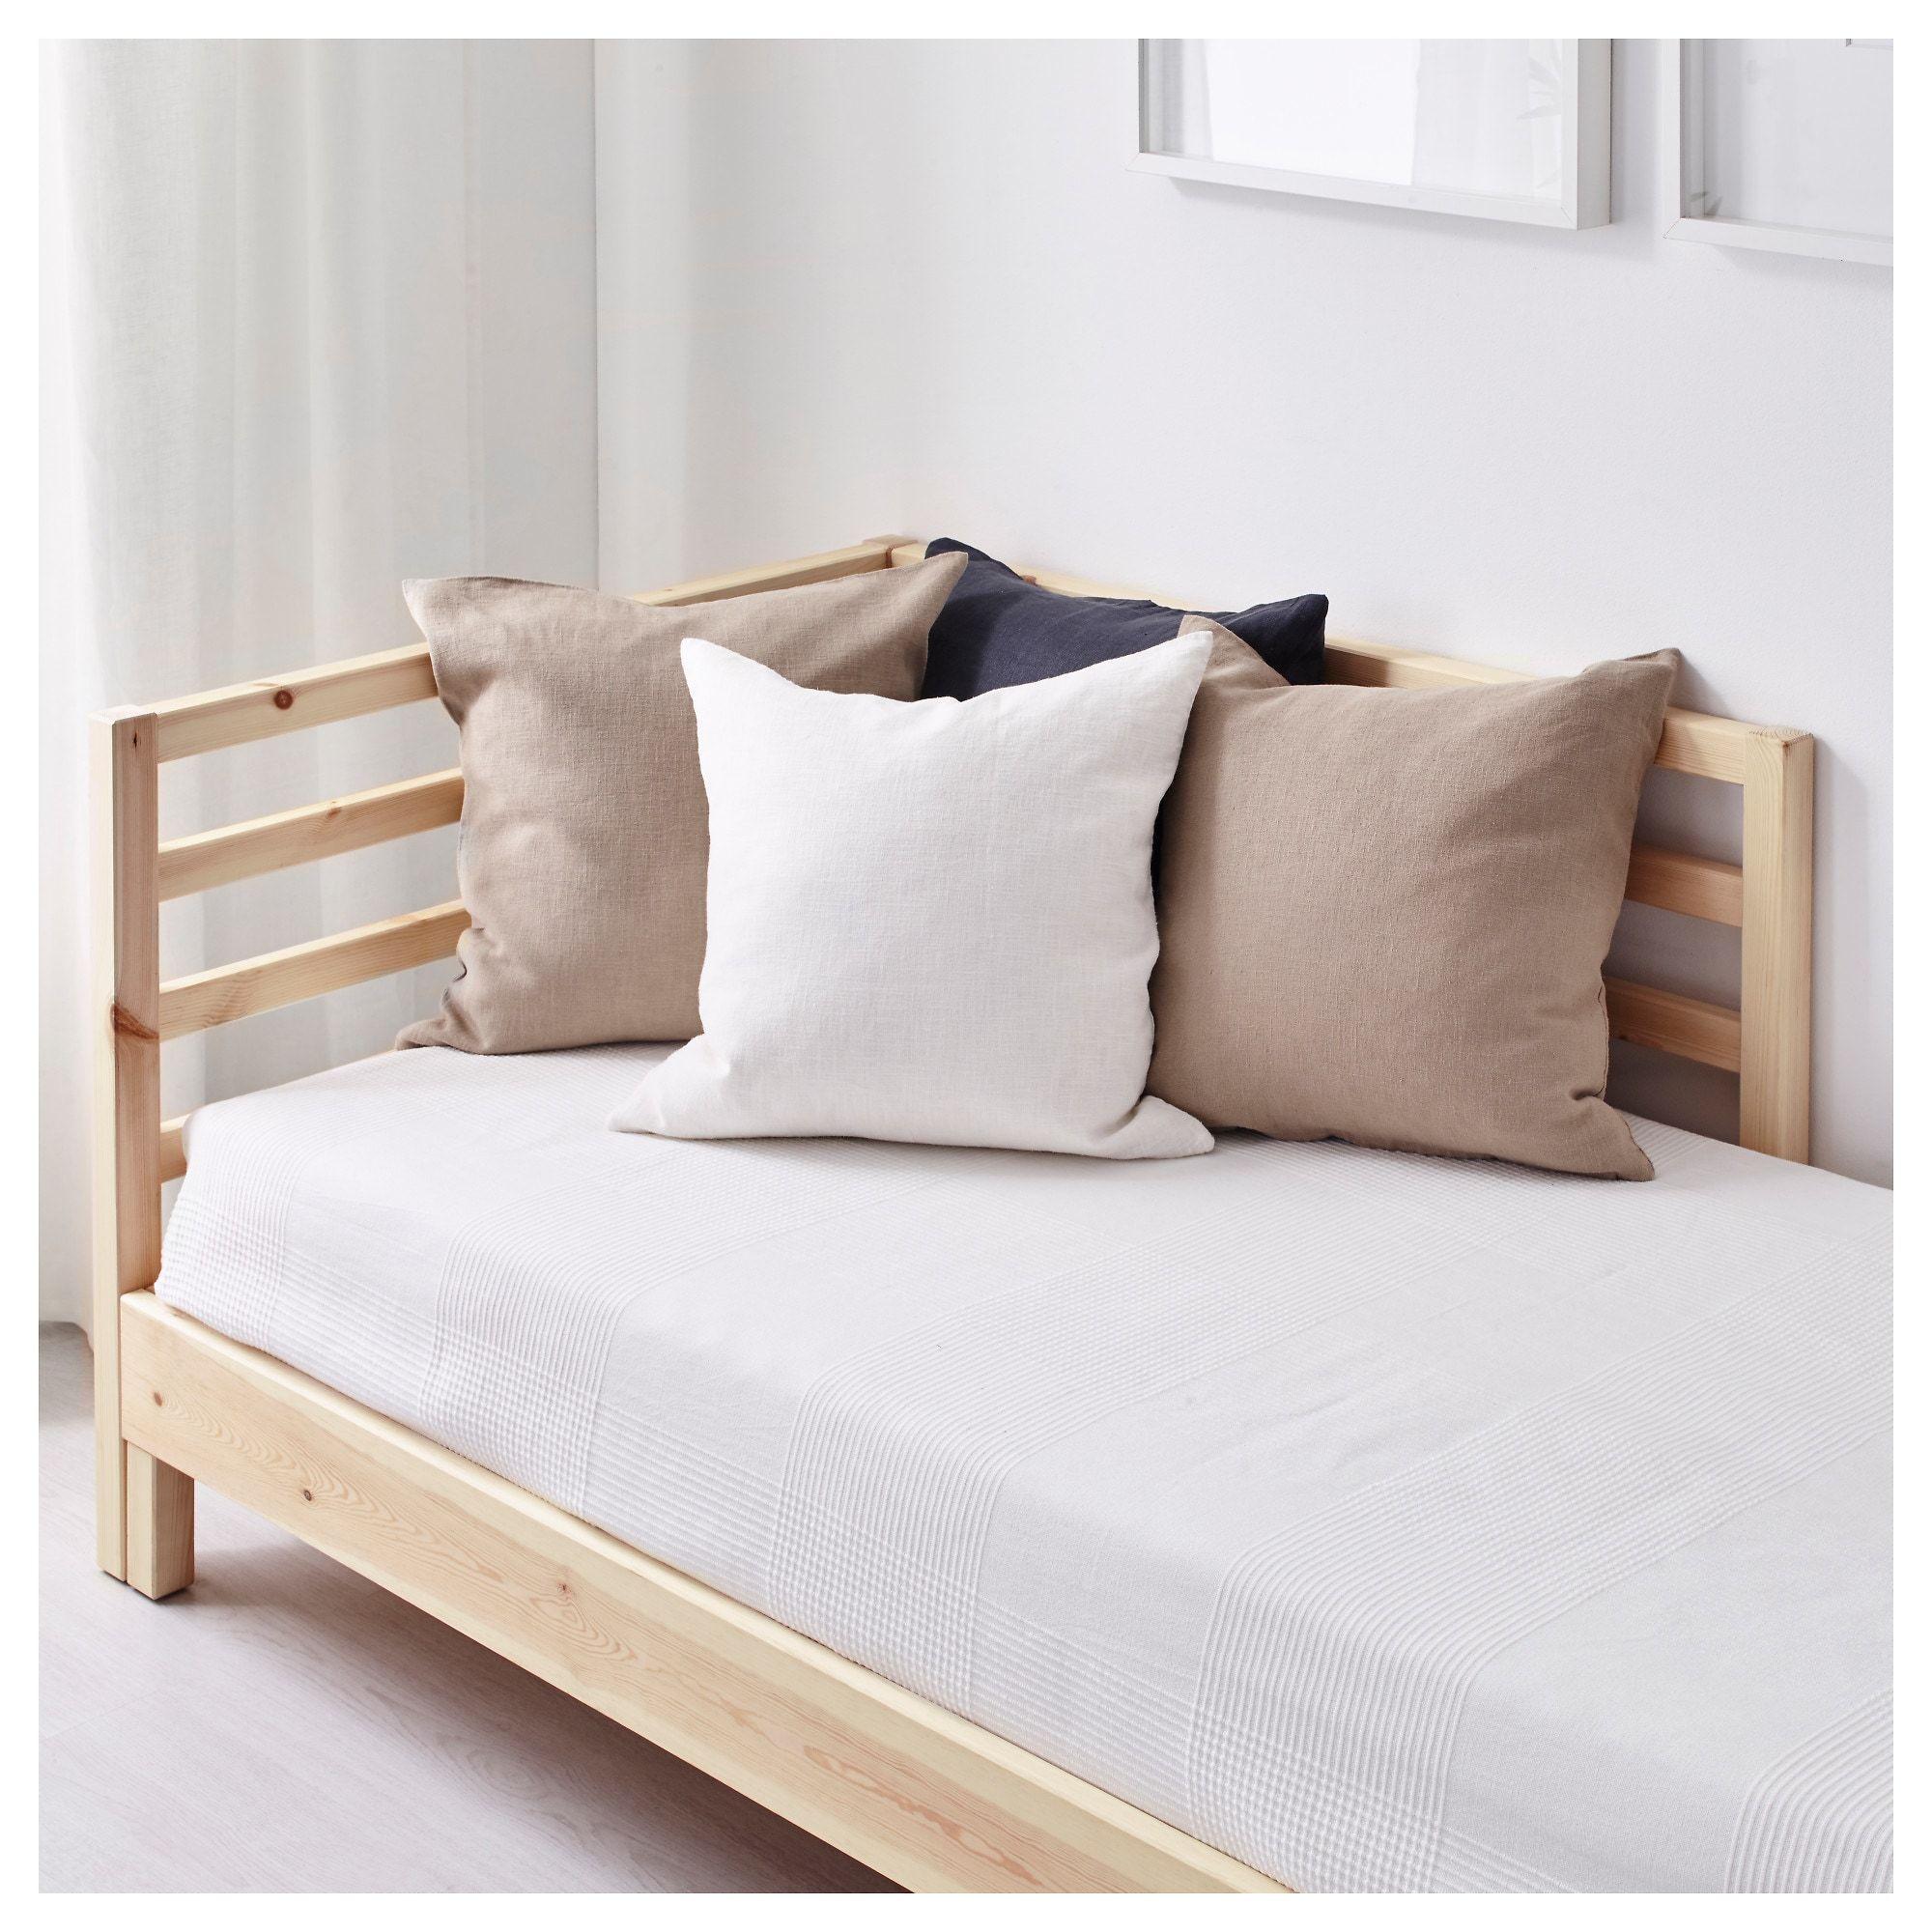 IKEA US Furniture and Home Furnishings Ikea daybed